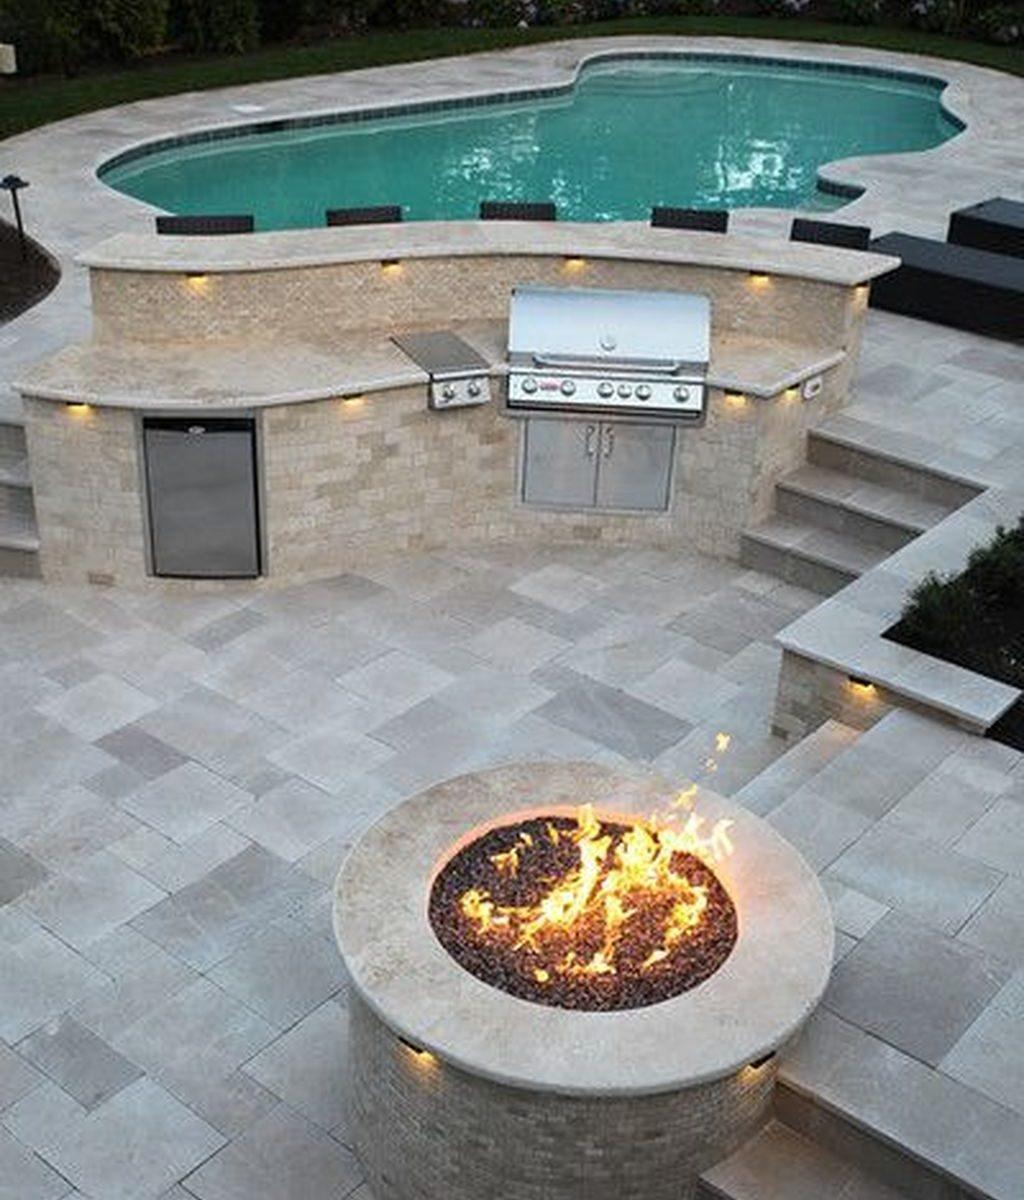 Fabulous Backyard Pool Landscaping Ideas You Never Seen Before 11